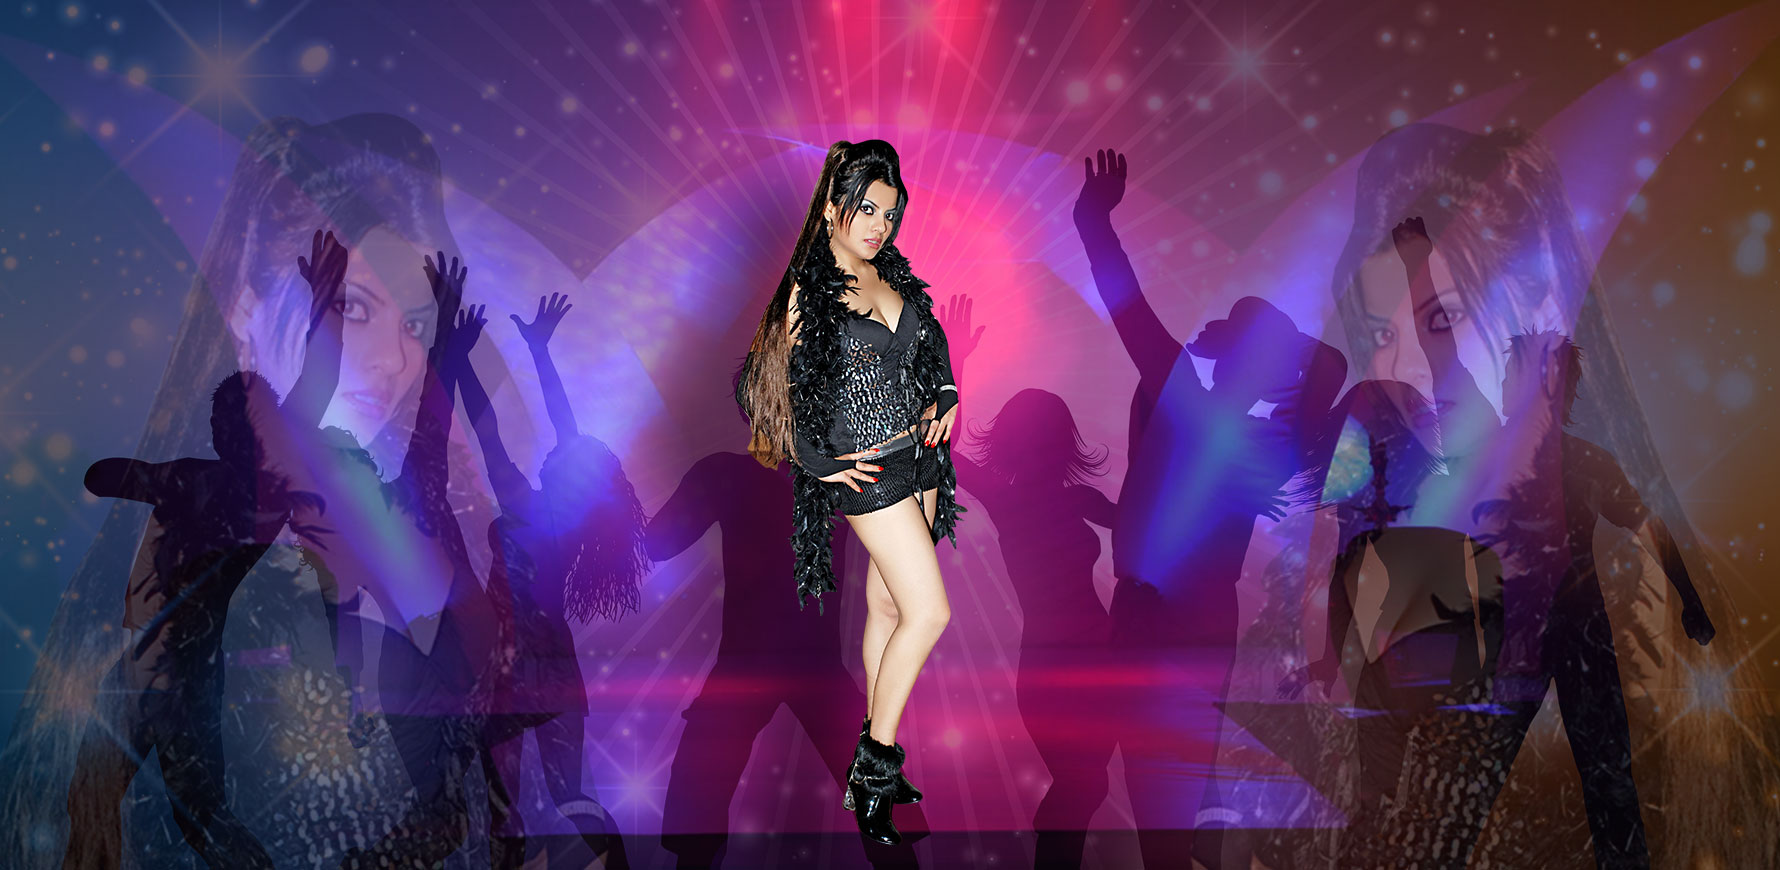 http://www.shradhasharma.com/wp-content/uploads/2017/07/banner-new-5-1.jpg